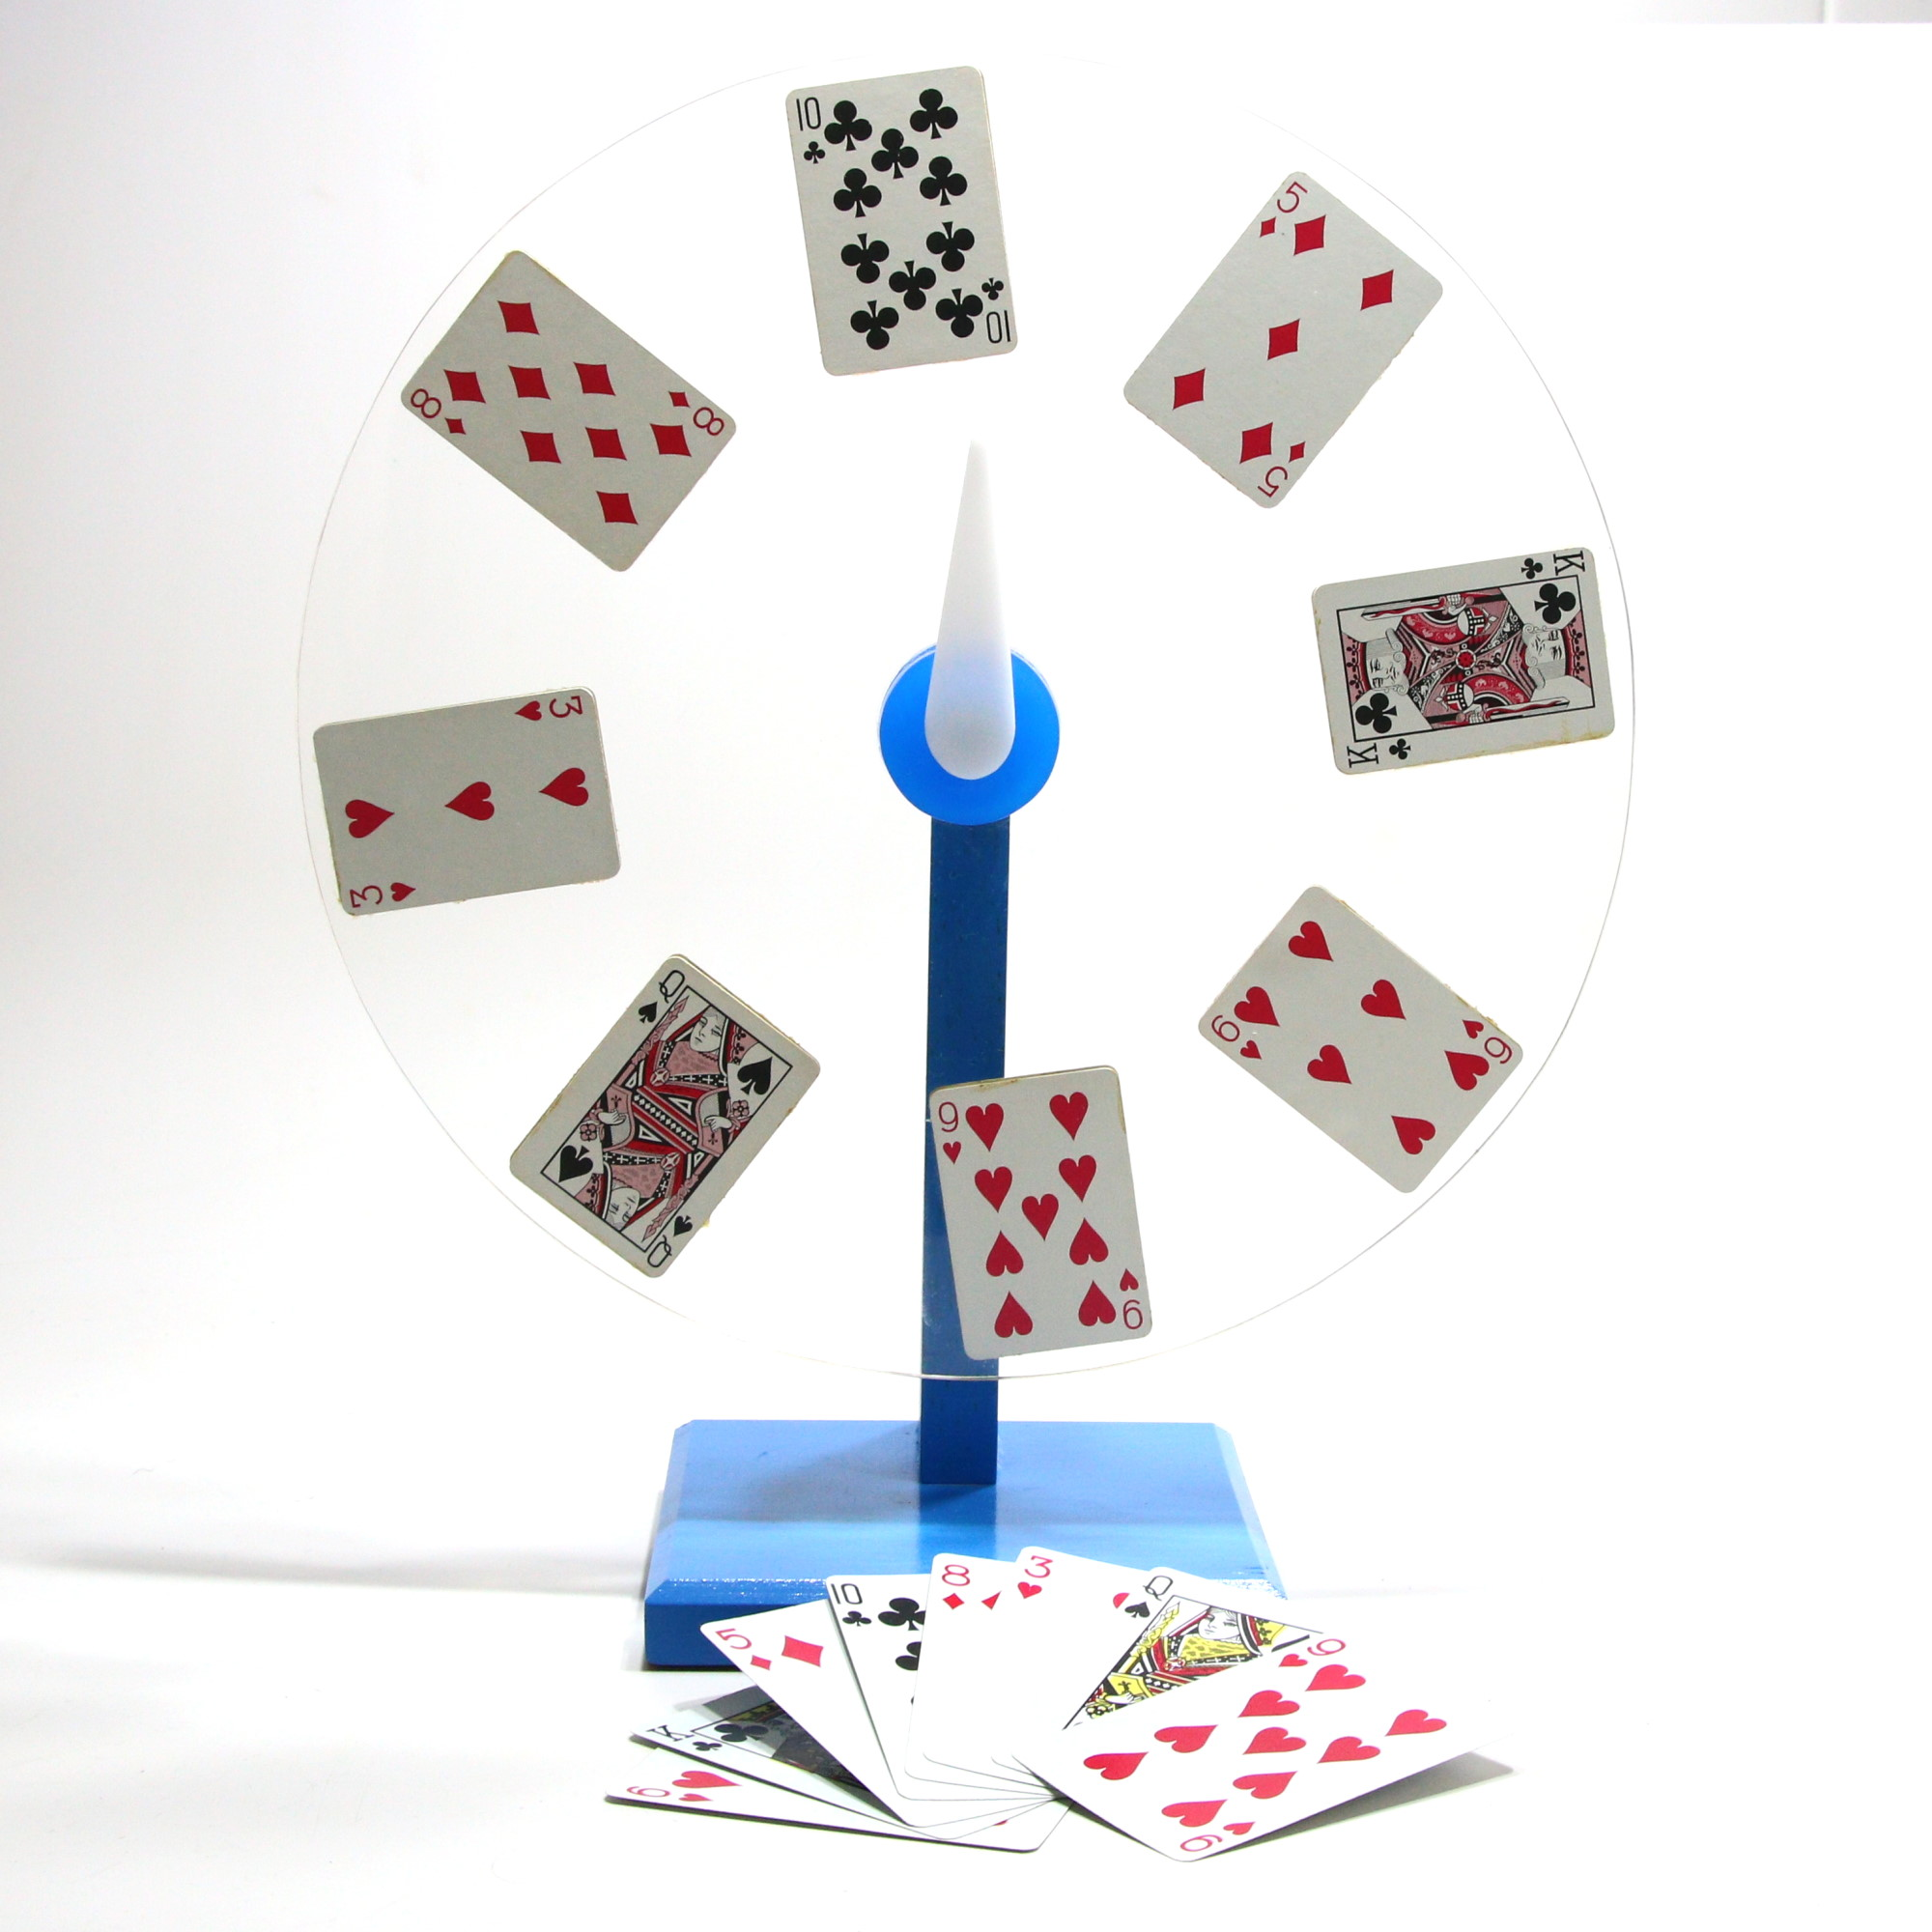 Spin A Card by Bob Kline